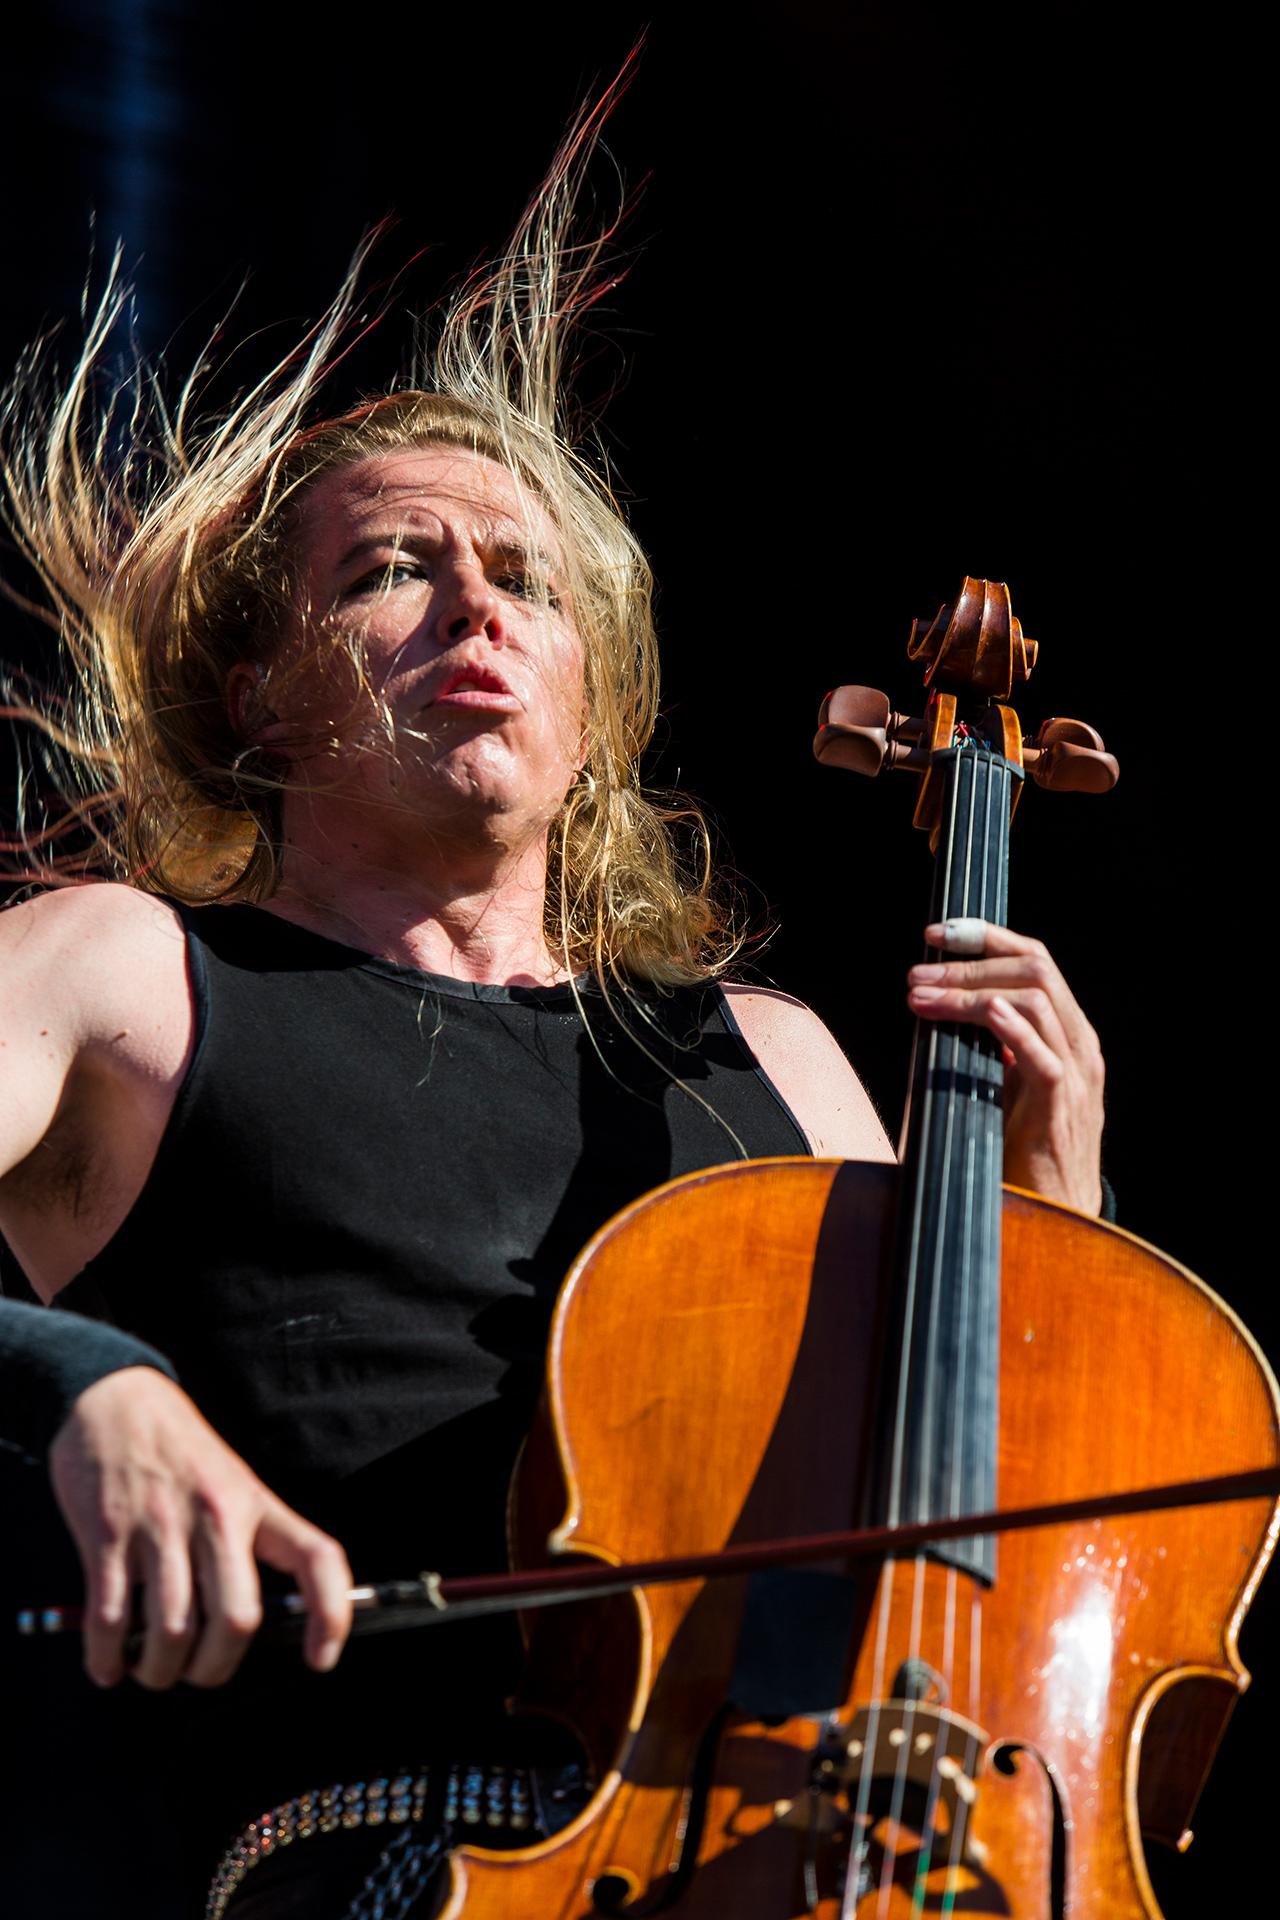 Eicca Toppinen, Apocalyptica band, Tuska metal festival